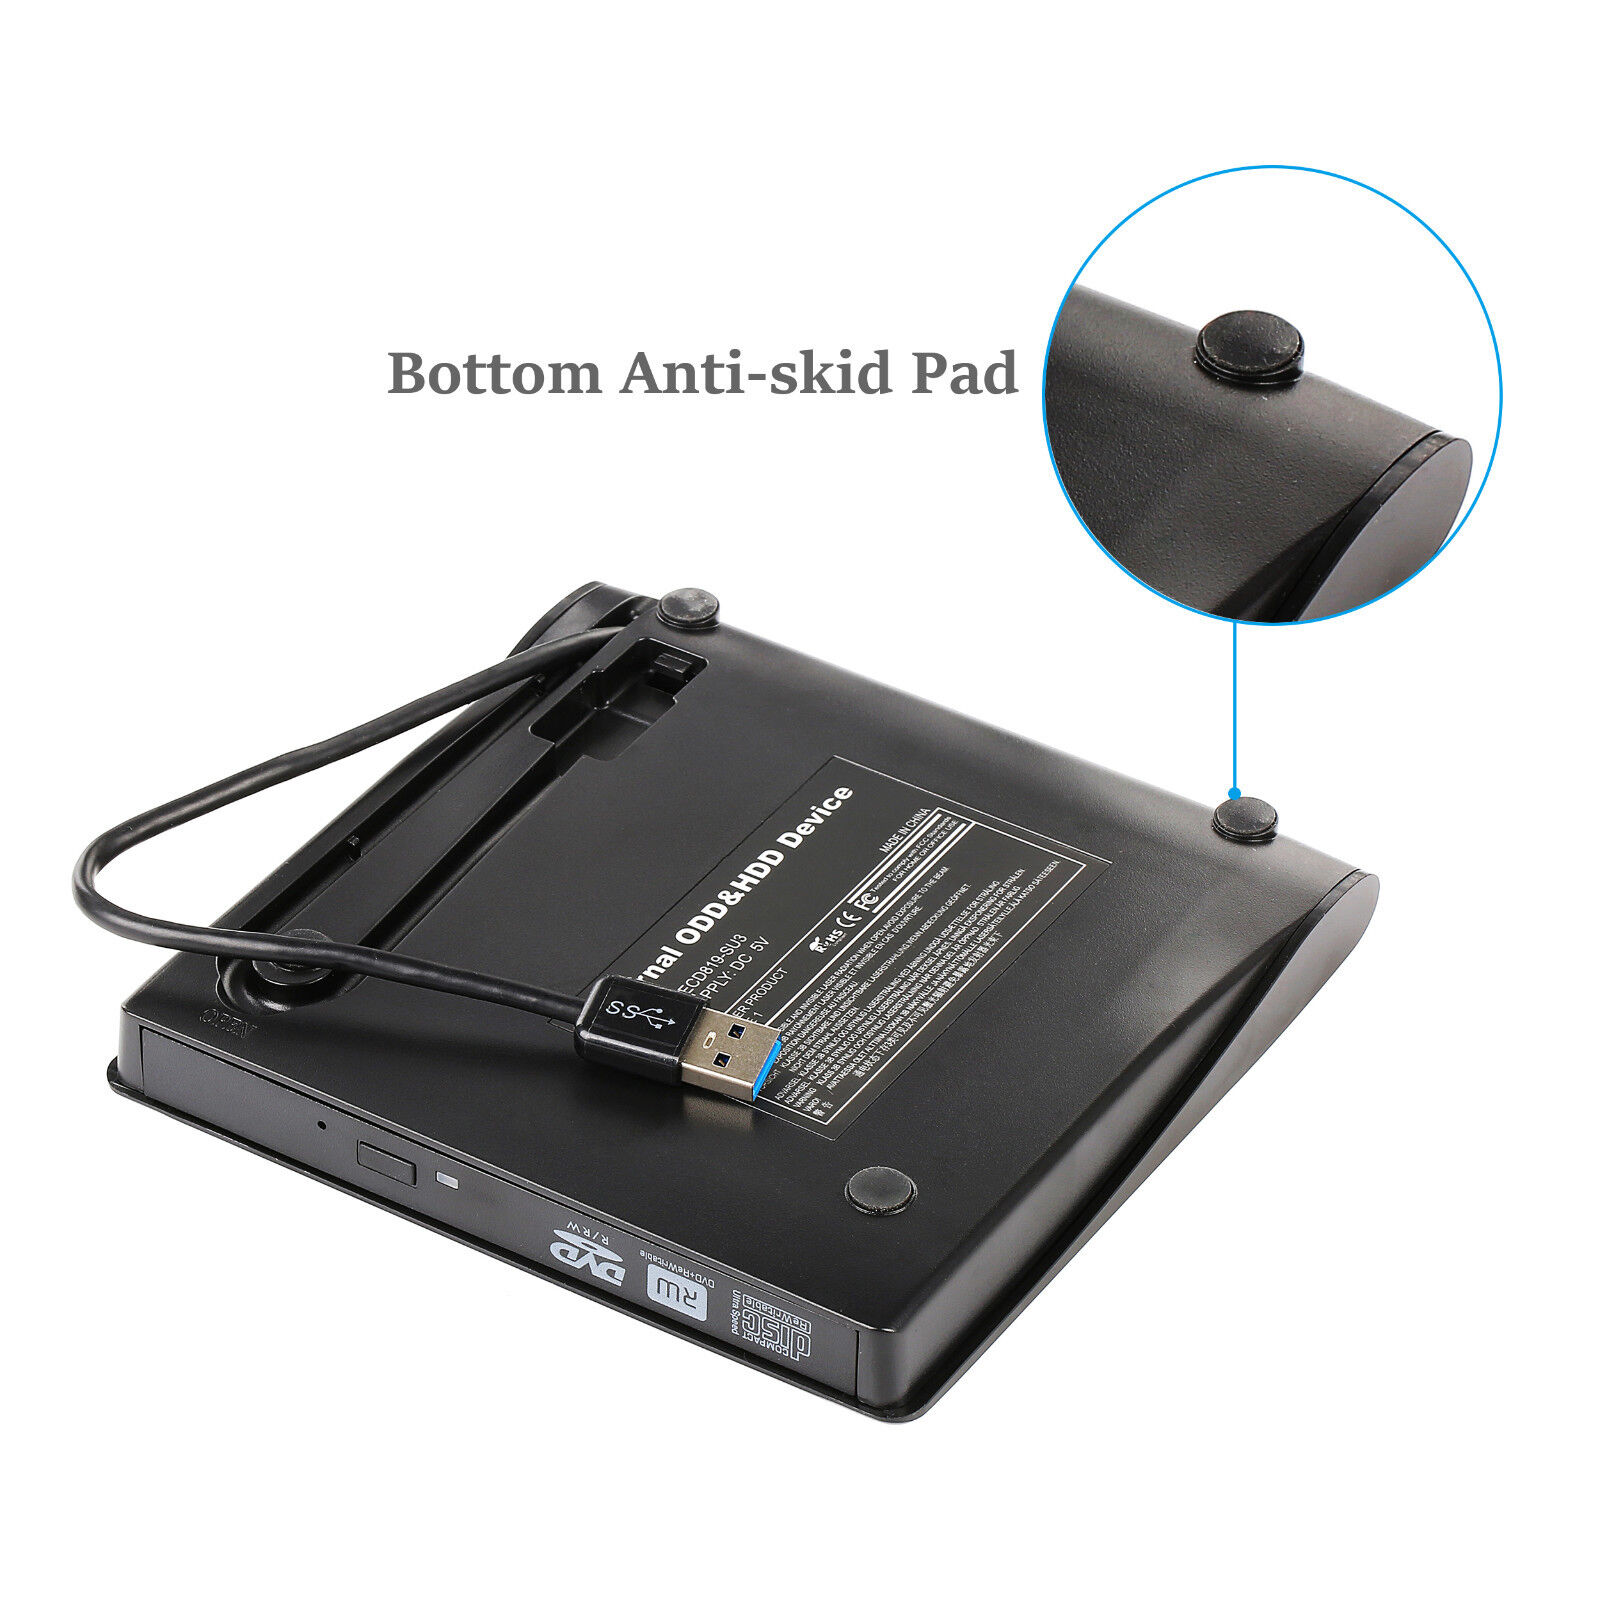 Slim External USB 3.0 DVD RW CD Writer Drive Burner Reader Player For Laptop PC CD, DVD & Blu-ray Drives